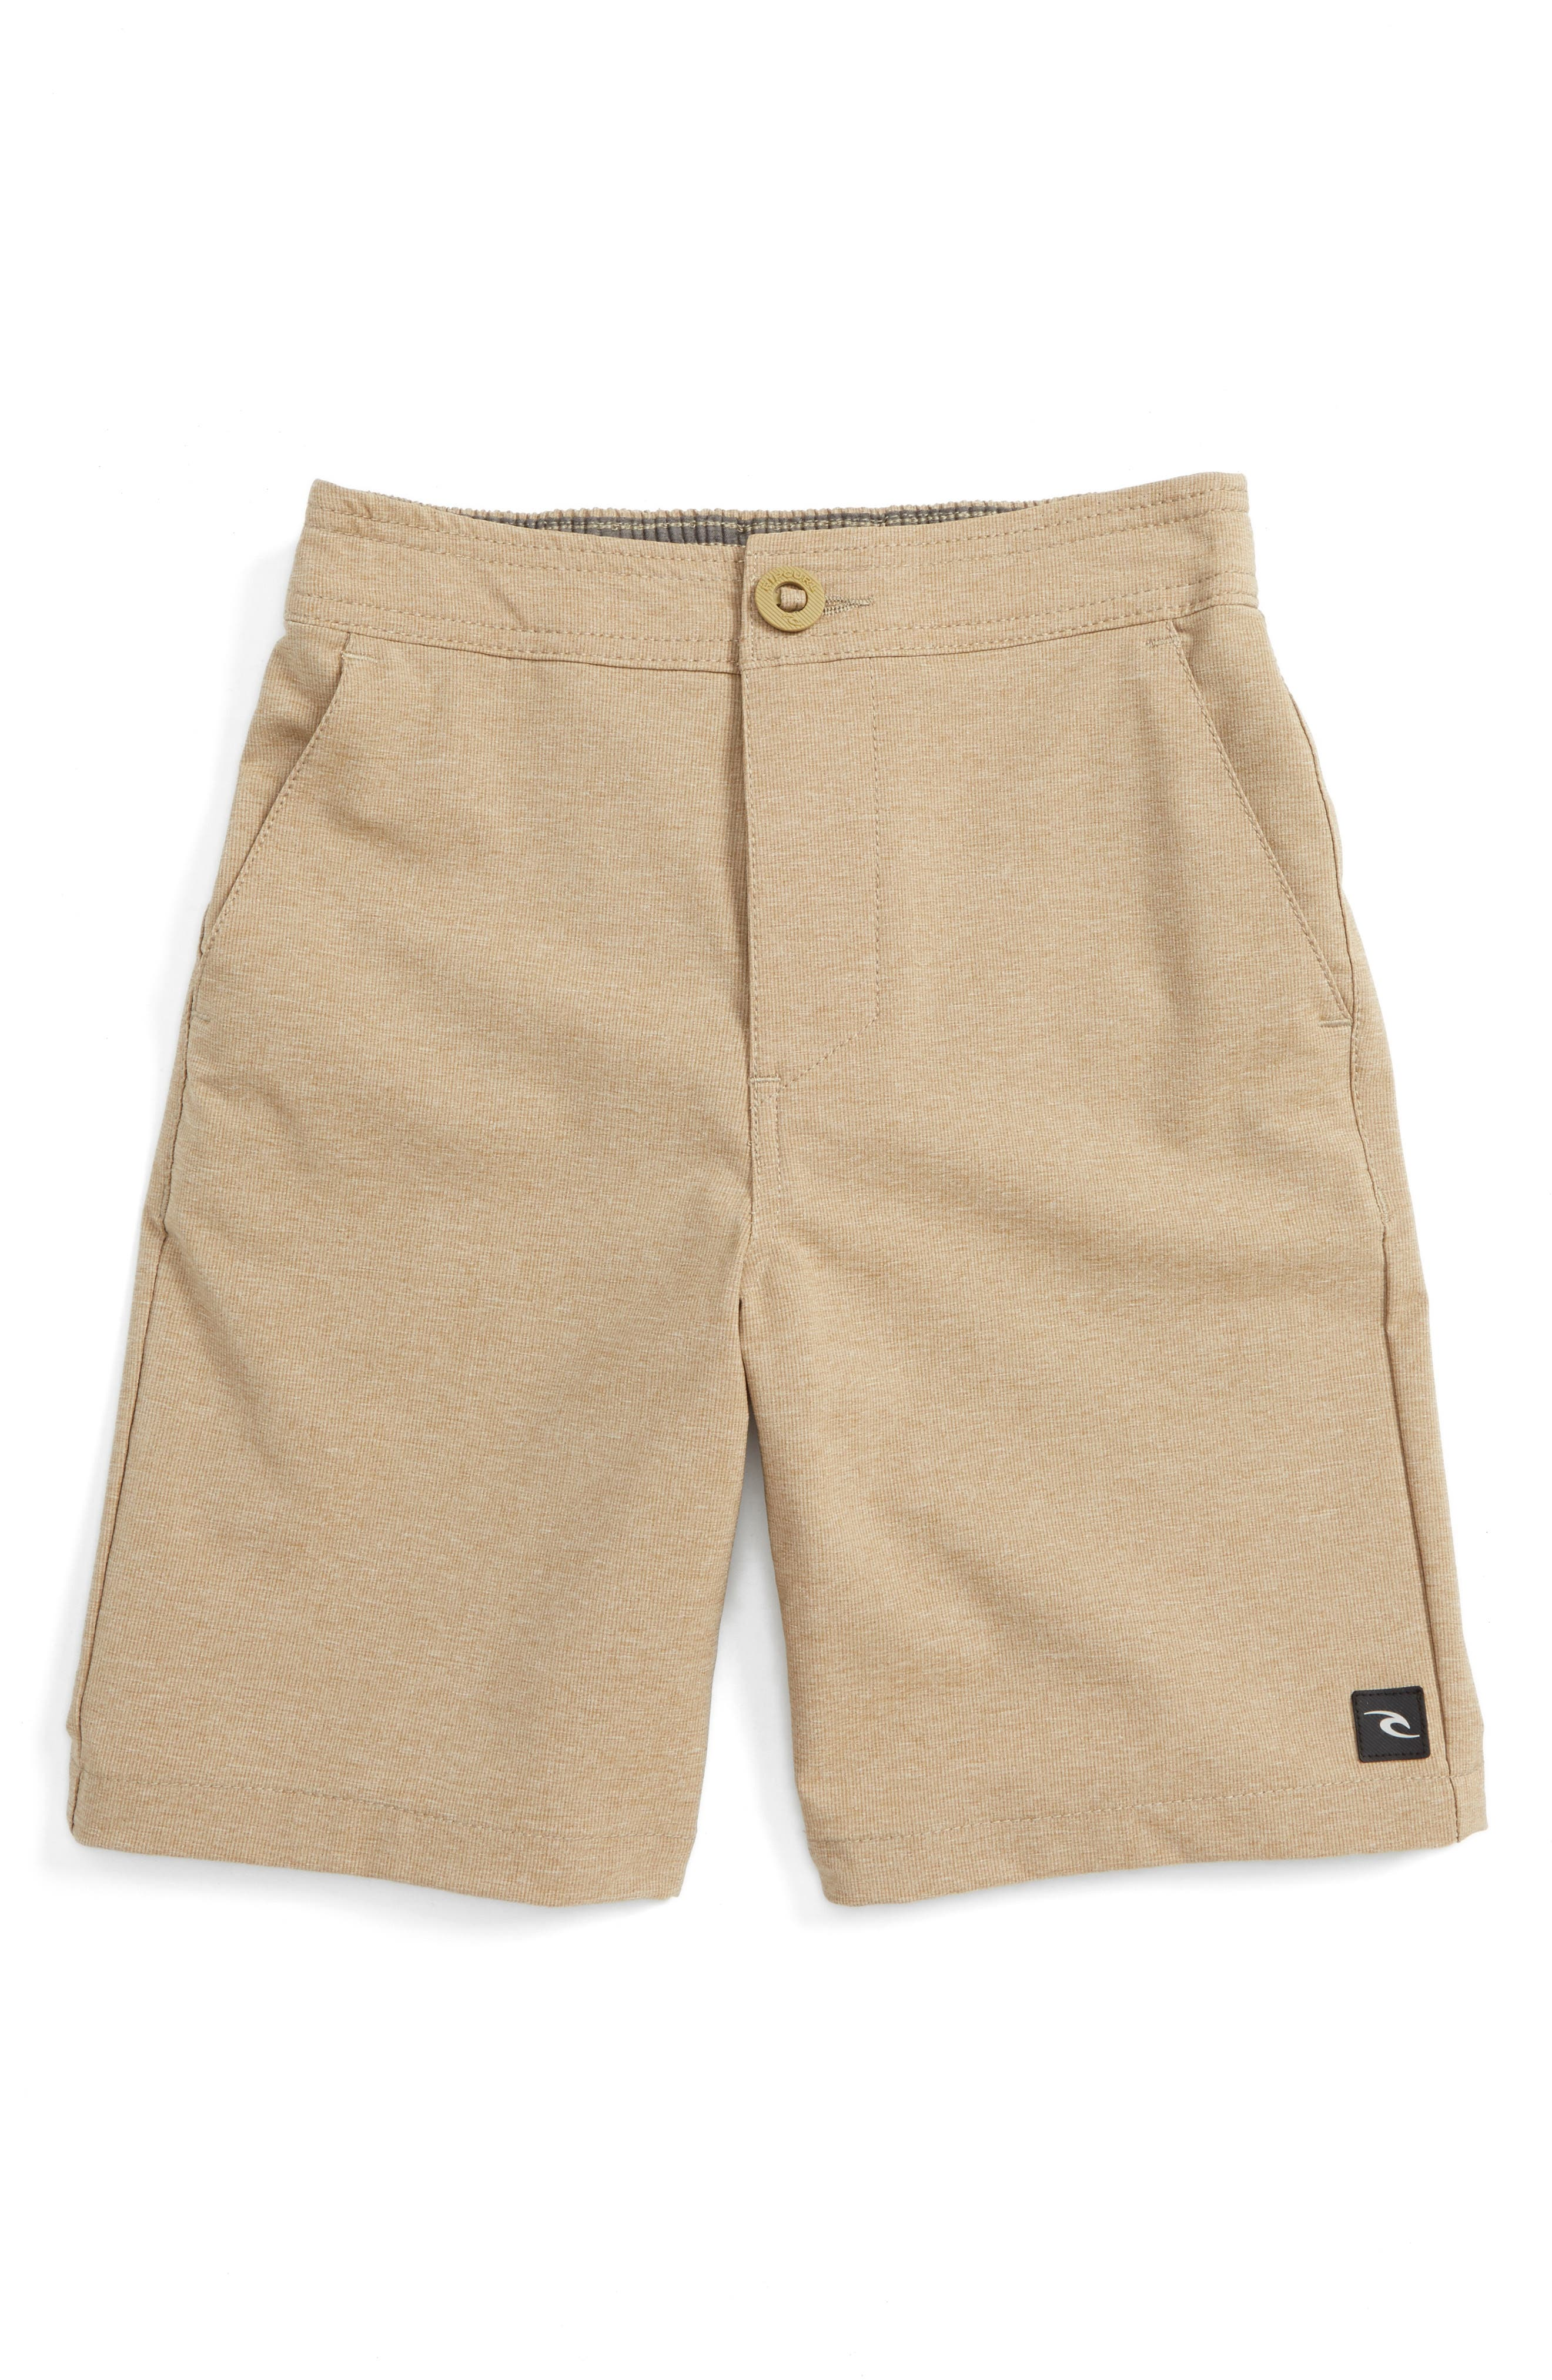 Rip Curl Omaha Hybrid Board Shorts (Toddler Boys & Little Boys)